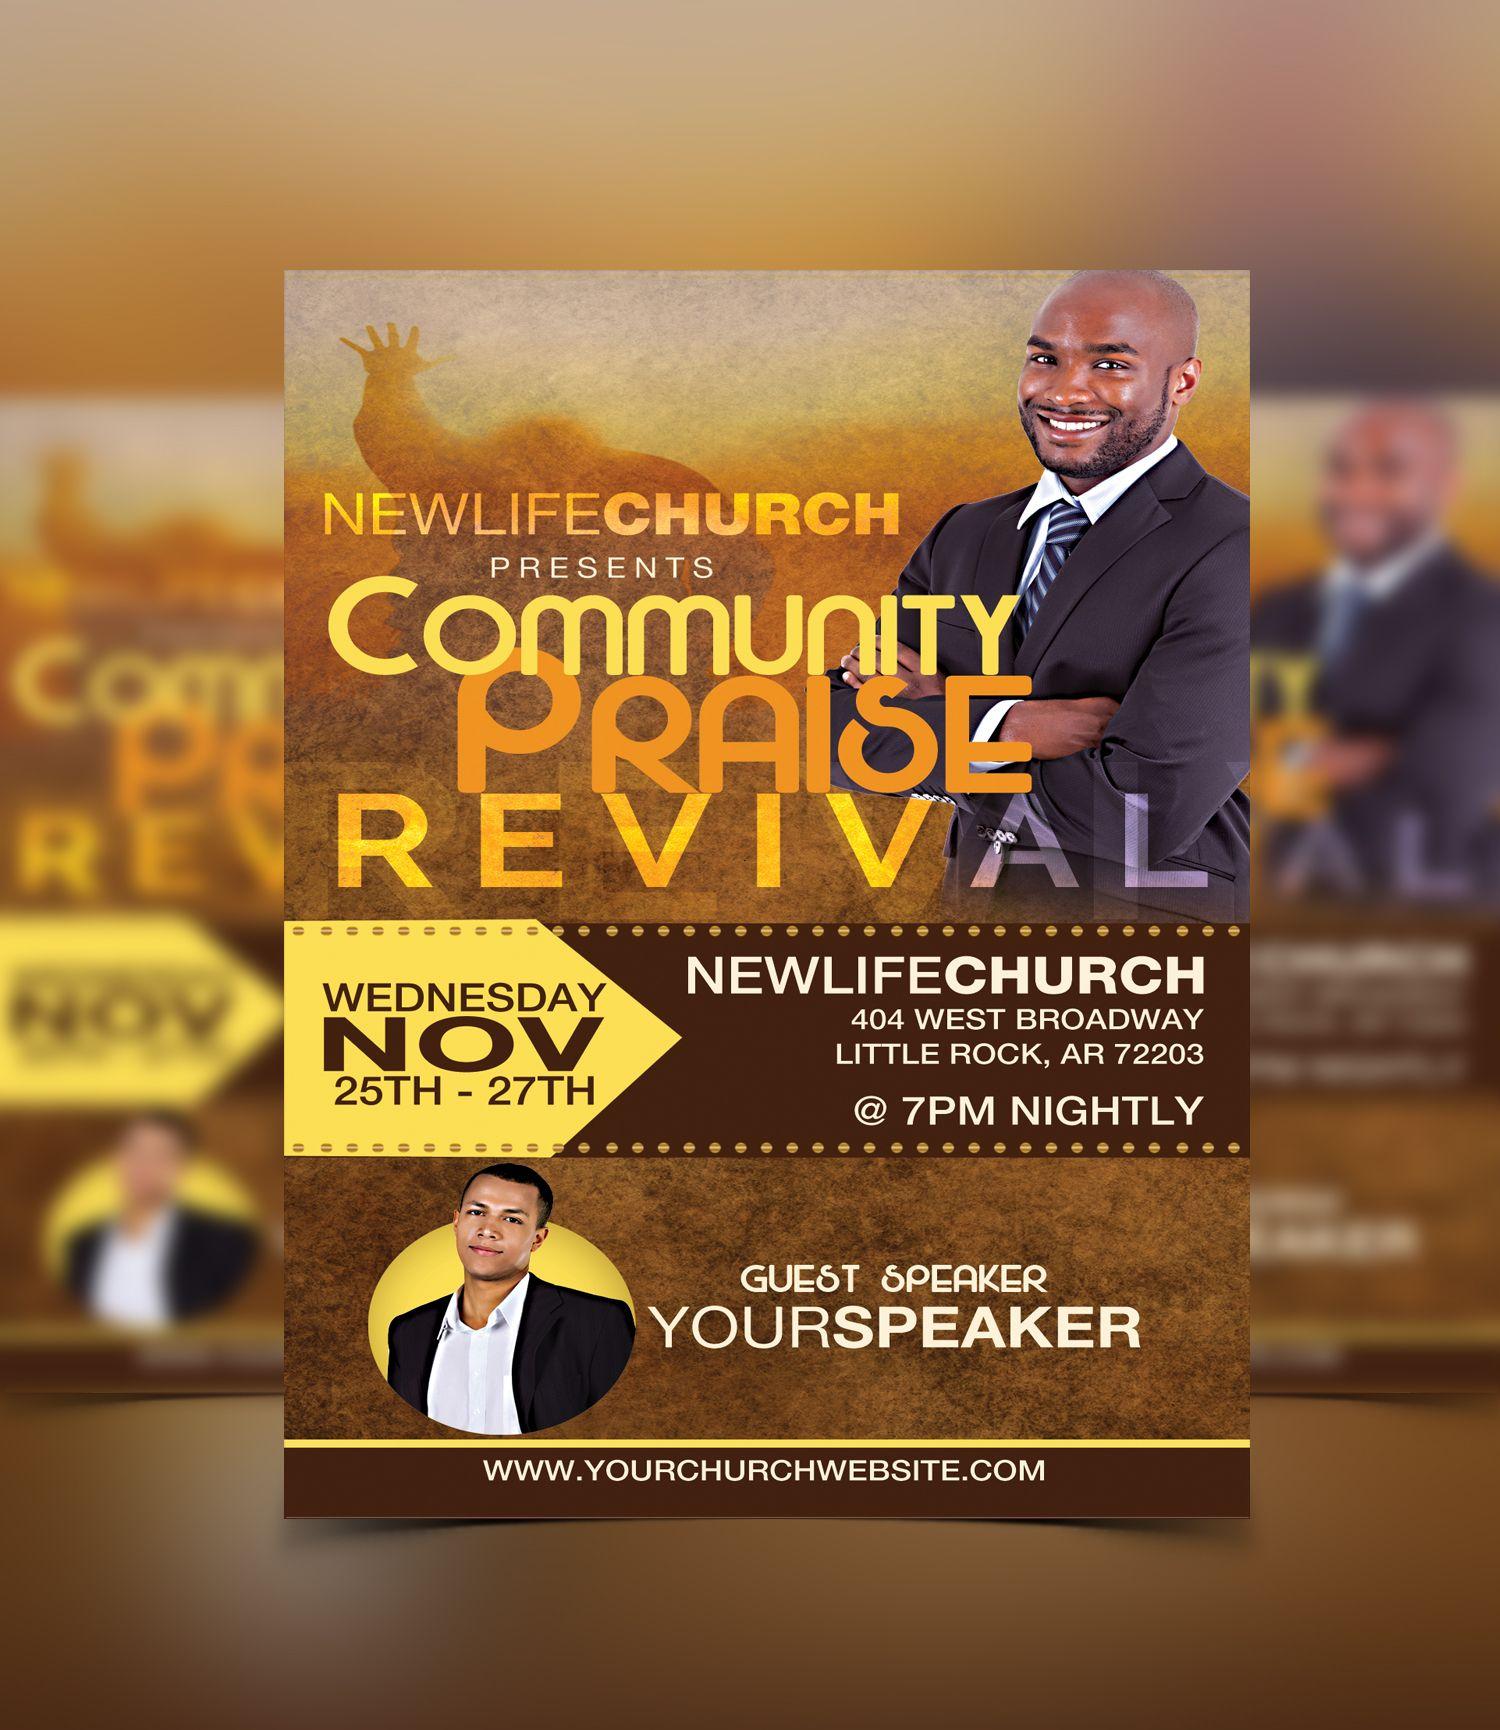 Revival Flyer Ibovnathandedecker